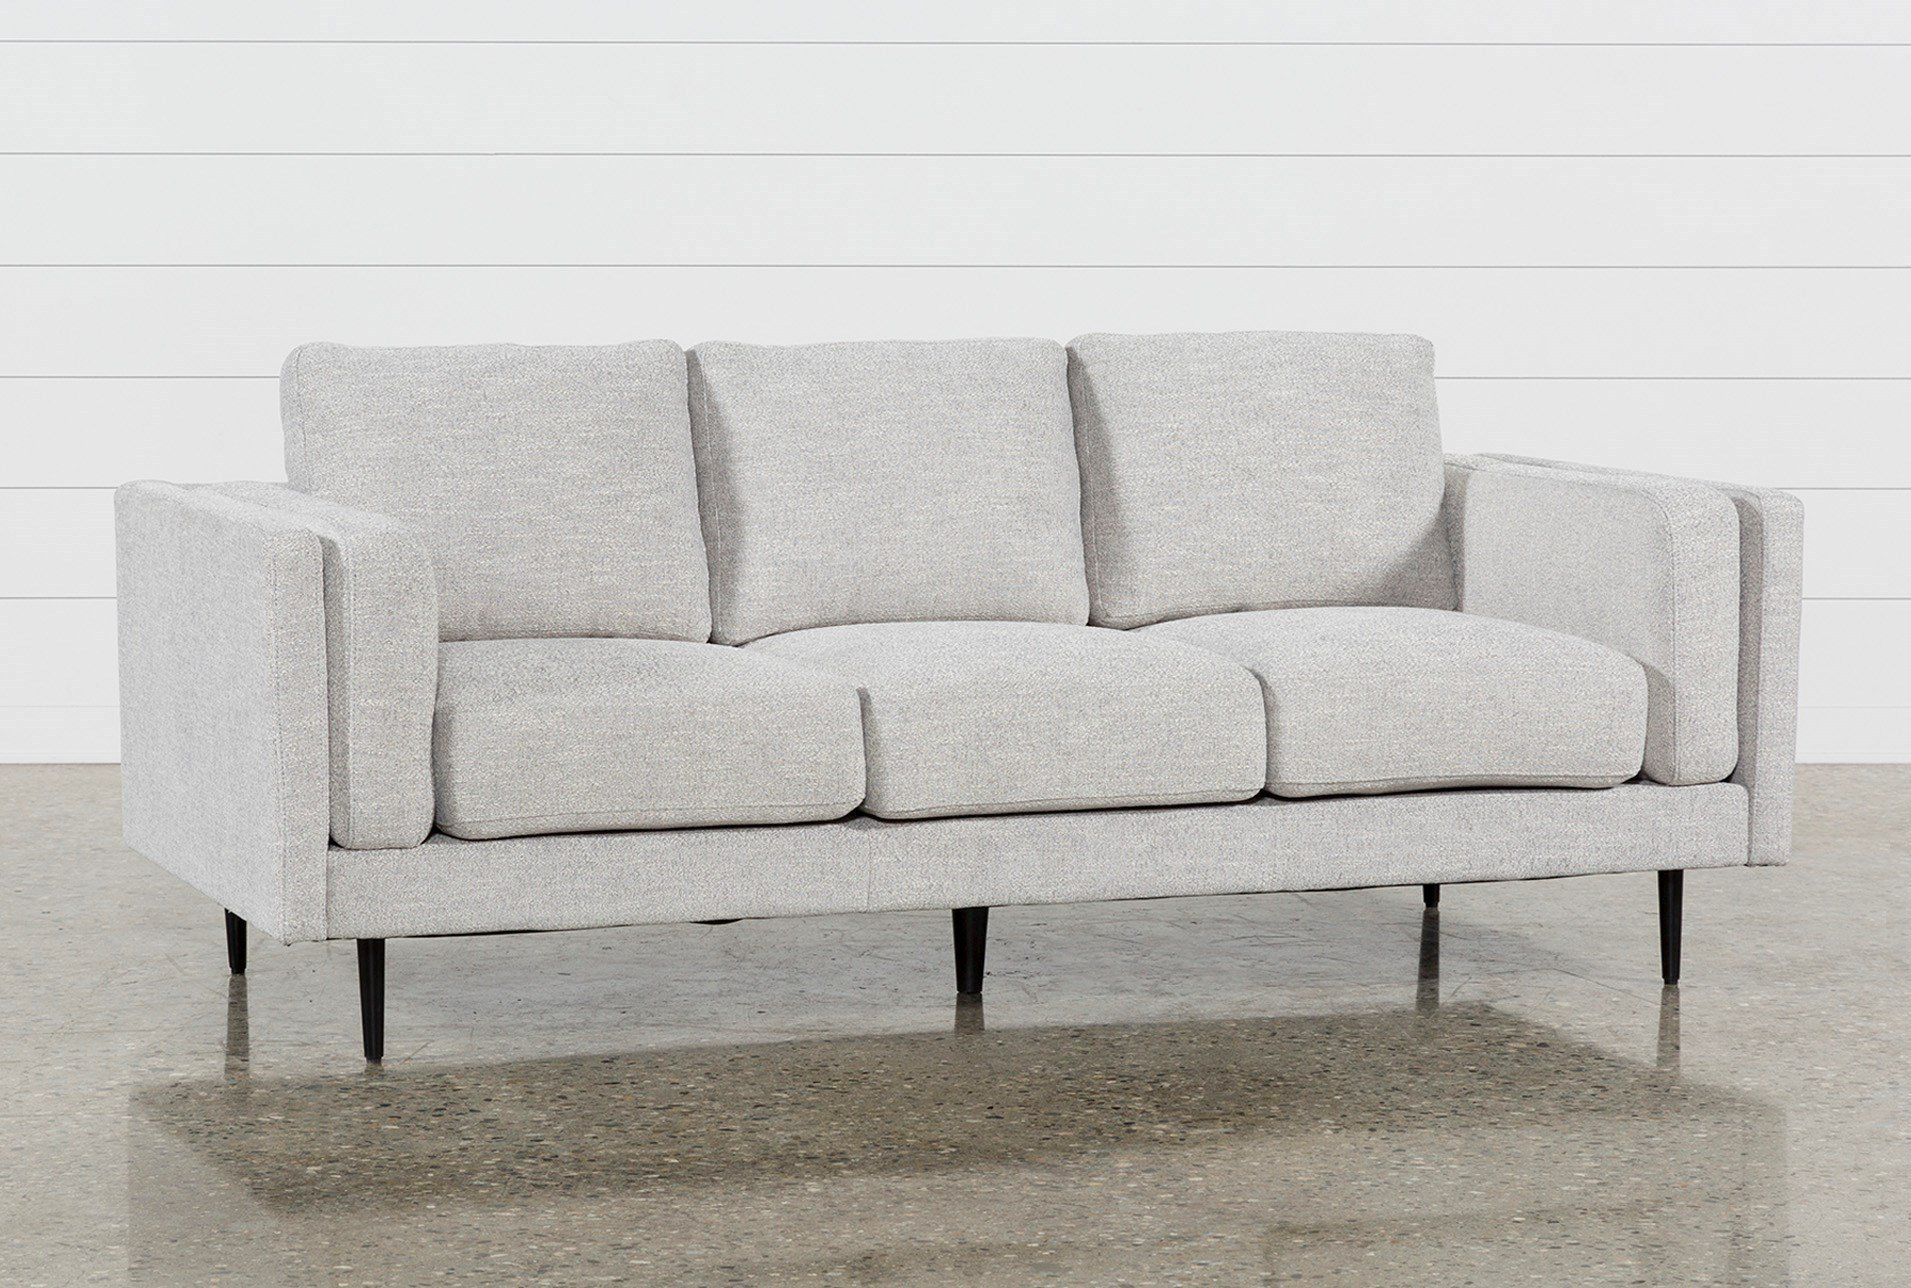 Aquarius Light Grey Sofa In 2018 | Covet: Home | Pinterest | Sofa Inside Aquarius Dark Grey Sofa Chairs (View 4 of 25)